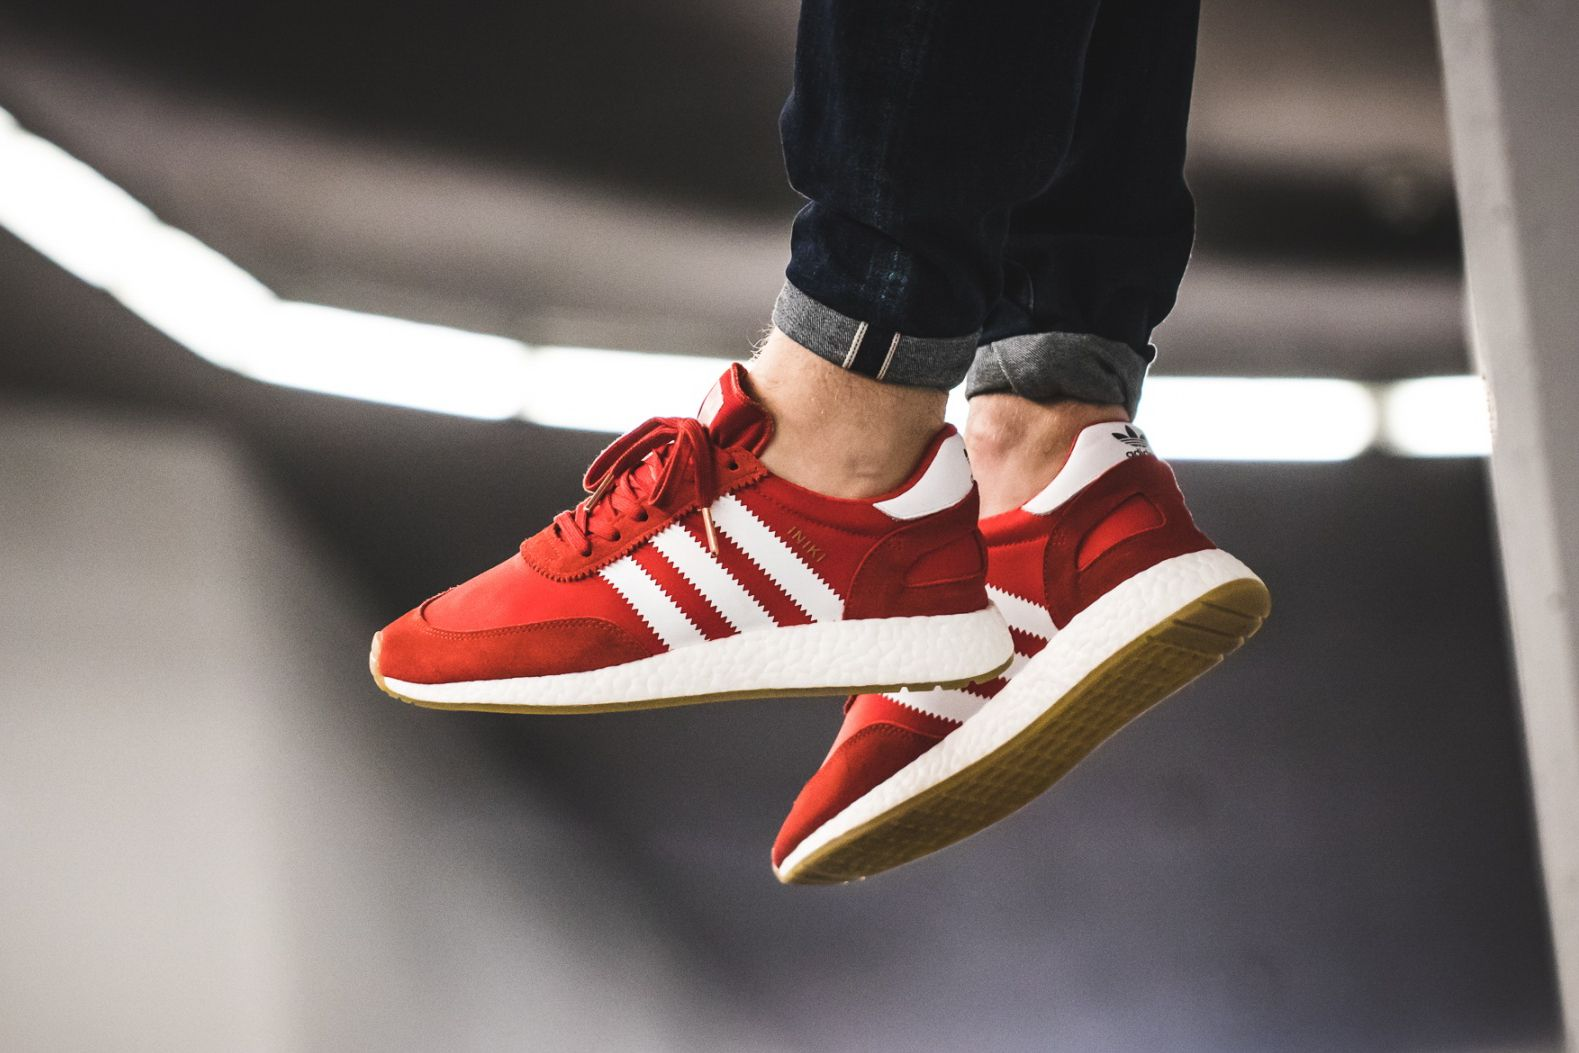 49bdf6c79e4 Adidas Iniki Runner On Feet  adidas  adidasinikirunner  trainers  sneakers